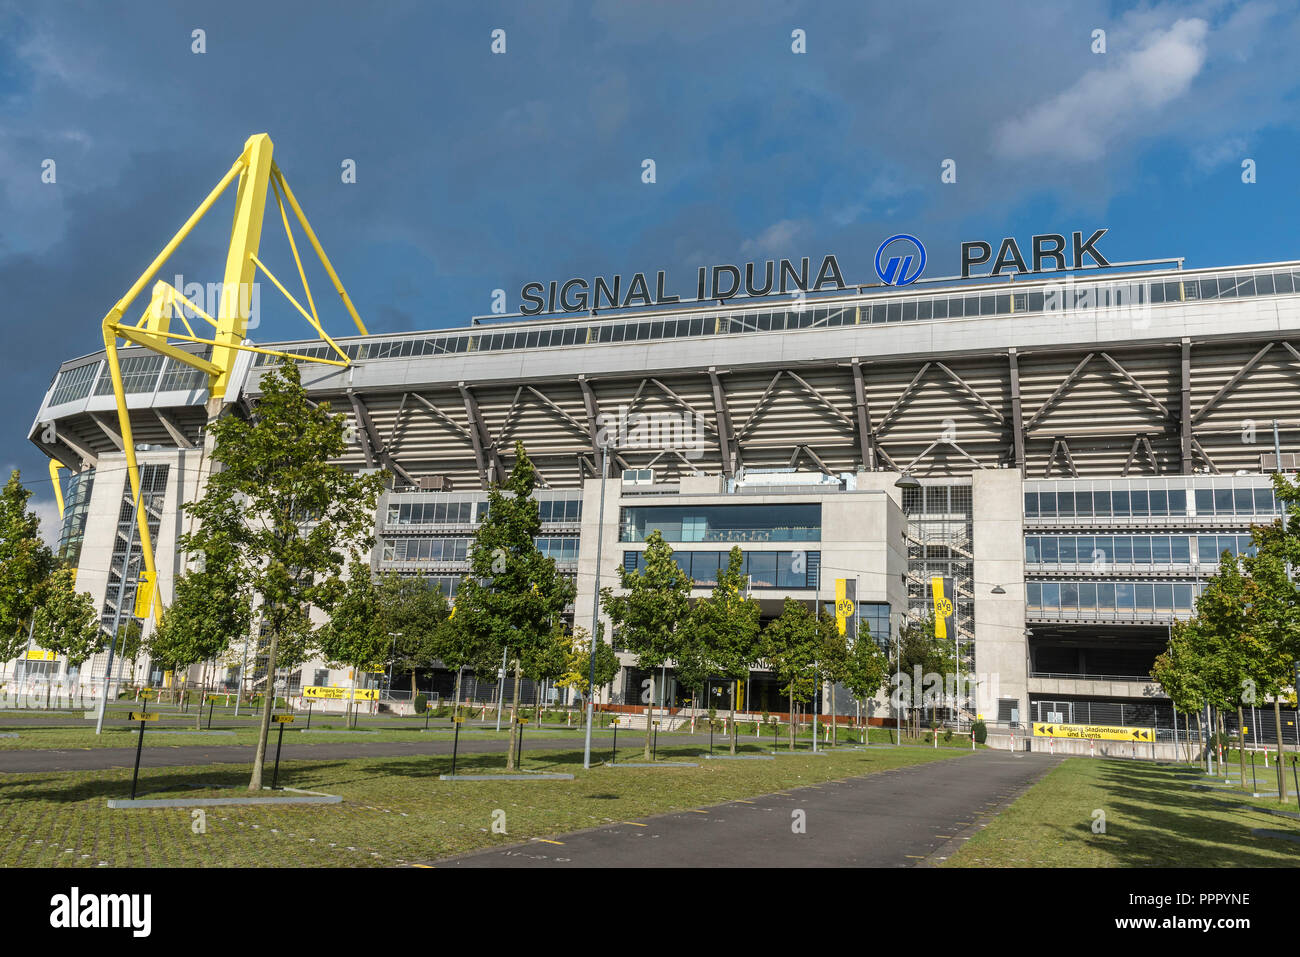 Signal Iduna Park, soccer stadium, BVB, Dortmund, Ruhr district, North Rhine-Westphalia, Germany Stock Photo